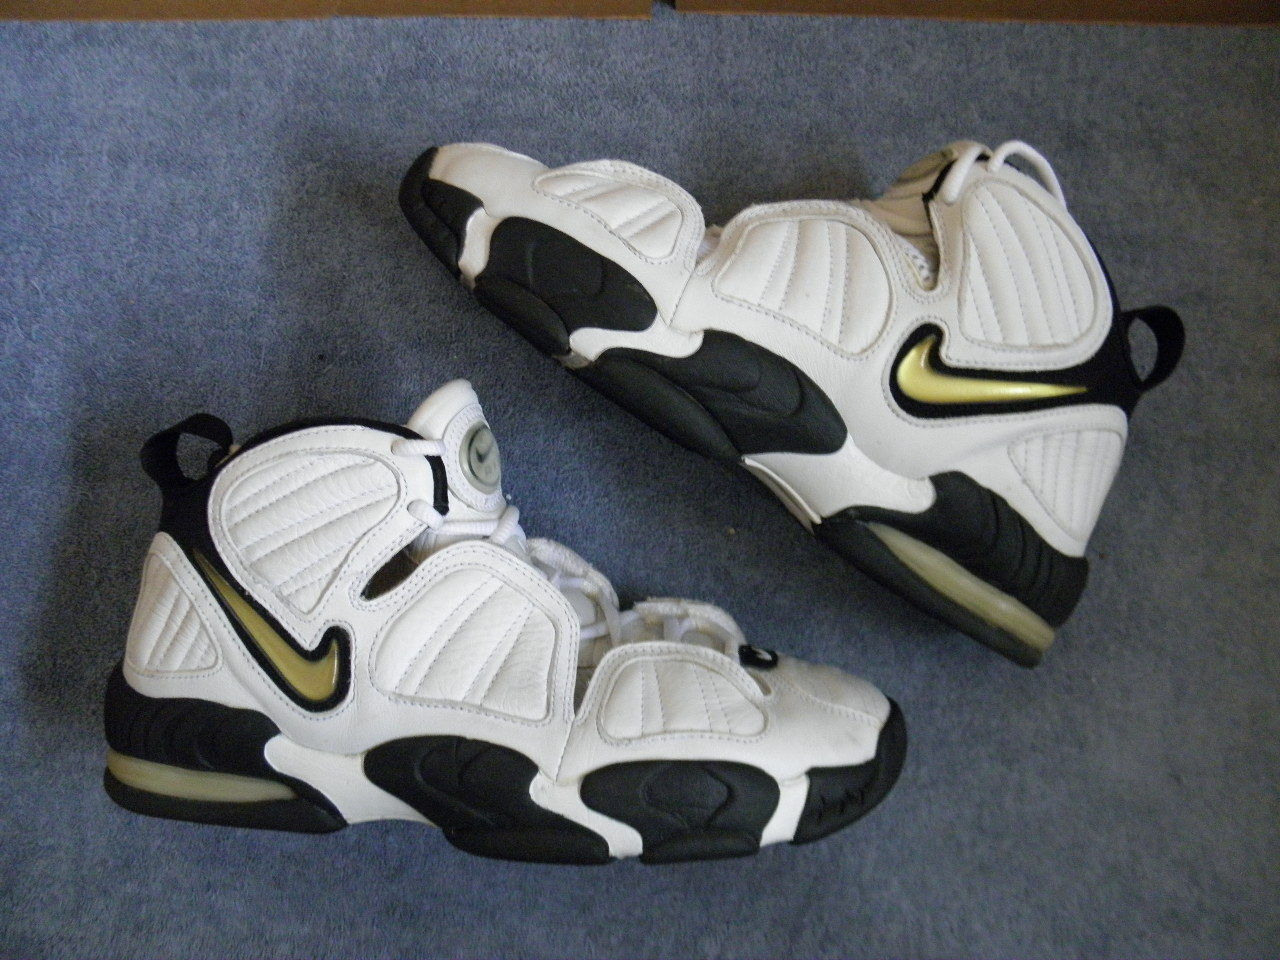 Nike Air Max Uptempo Zoom TB Team Basketball 3.0 Reggie Miller 11.5 vintage 90s